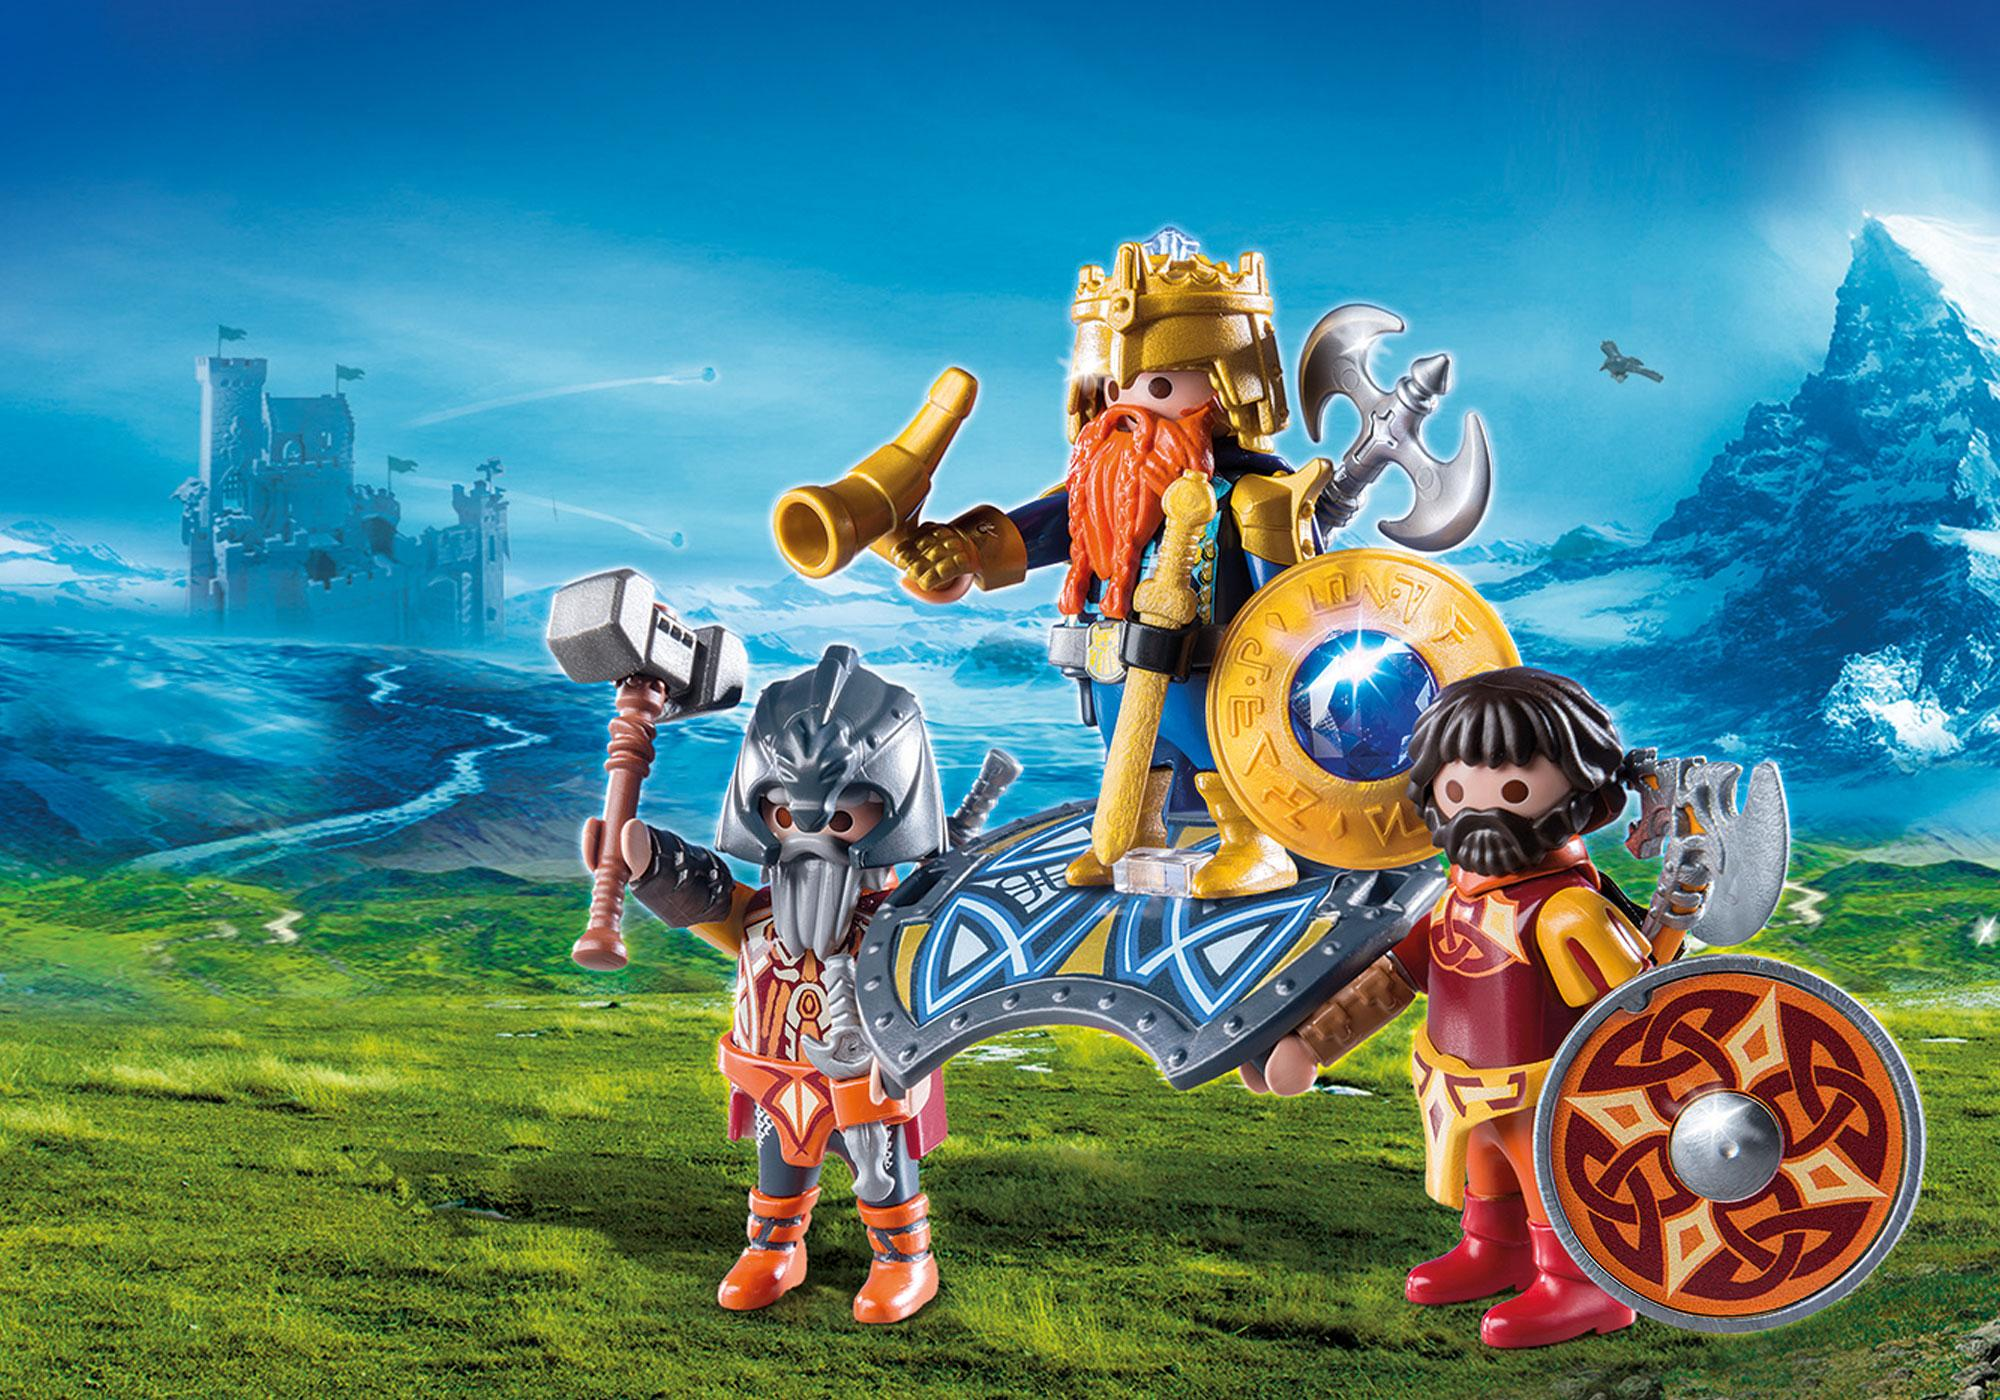 http://media.playmobil.com/i/playmobil/9344_product_detail/Βασιλιάς των Νάνων με δύο φρουρούς